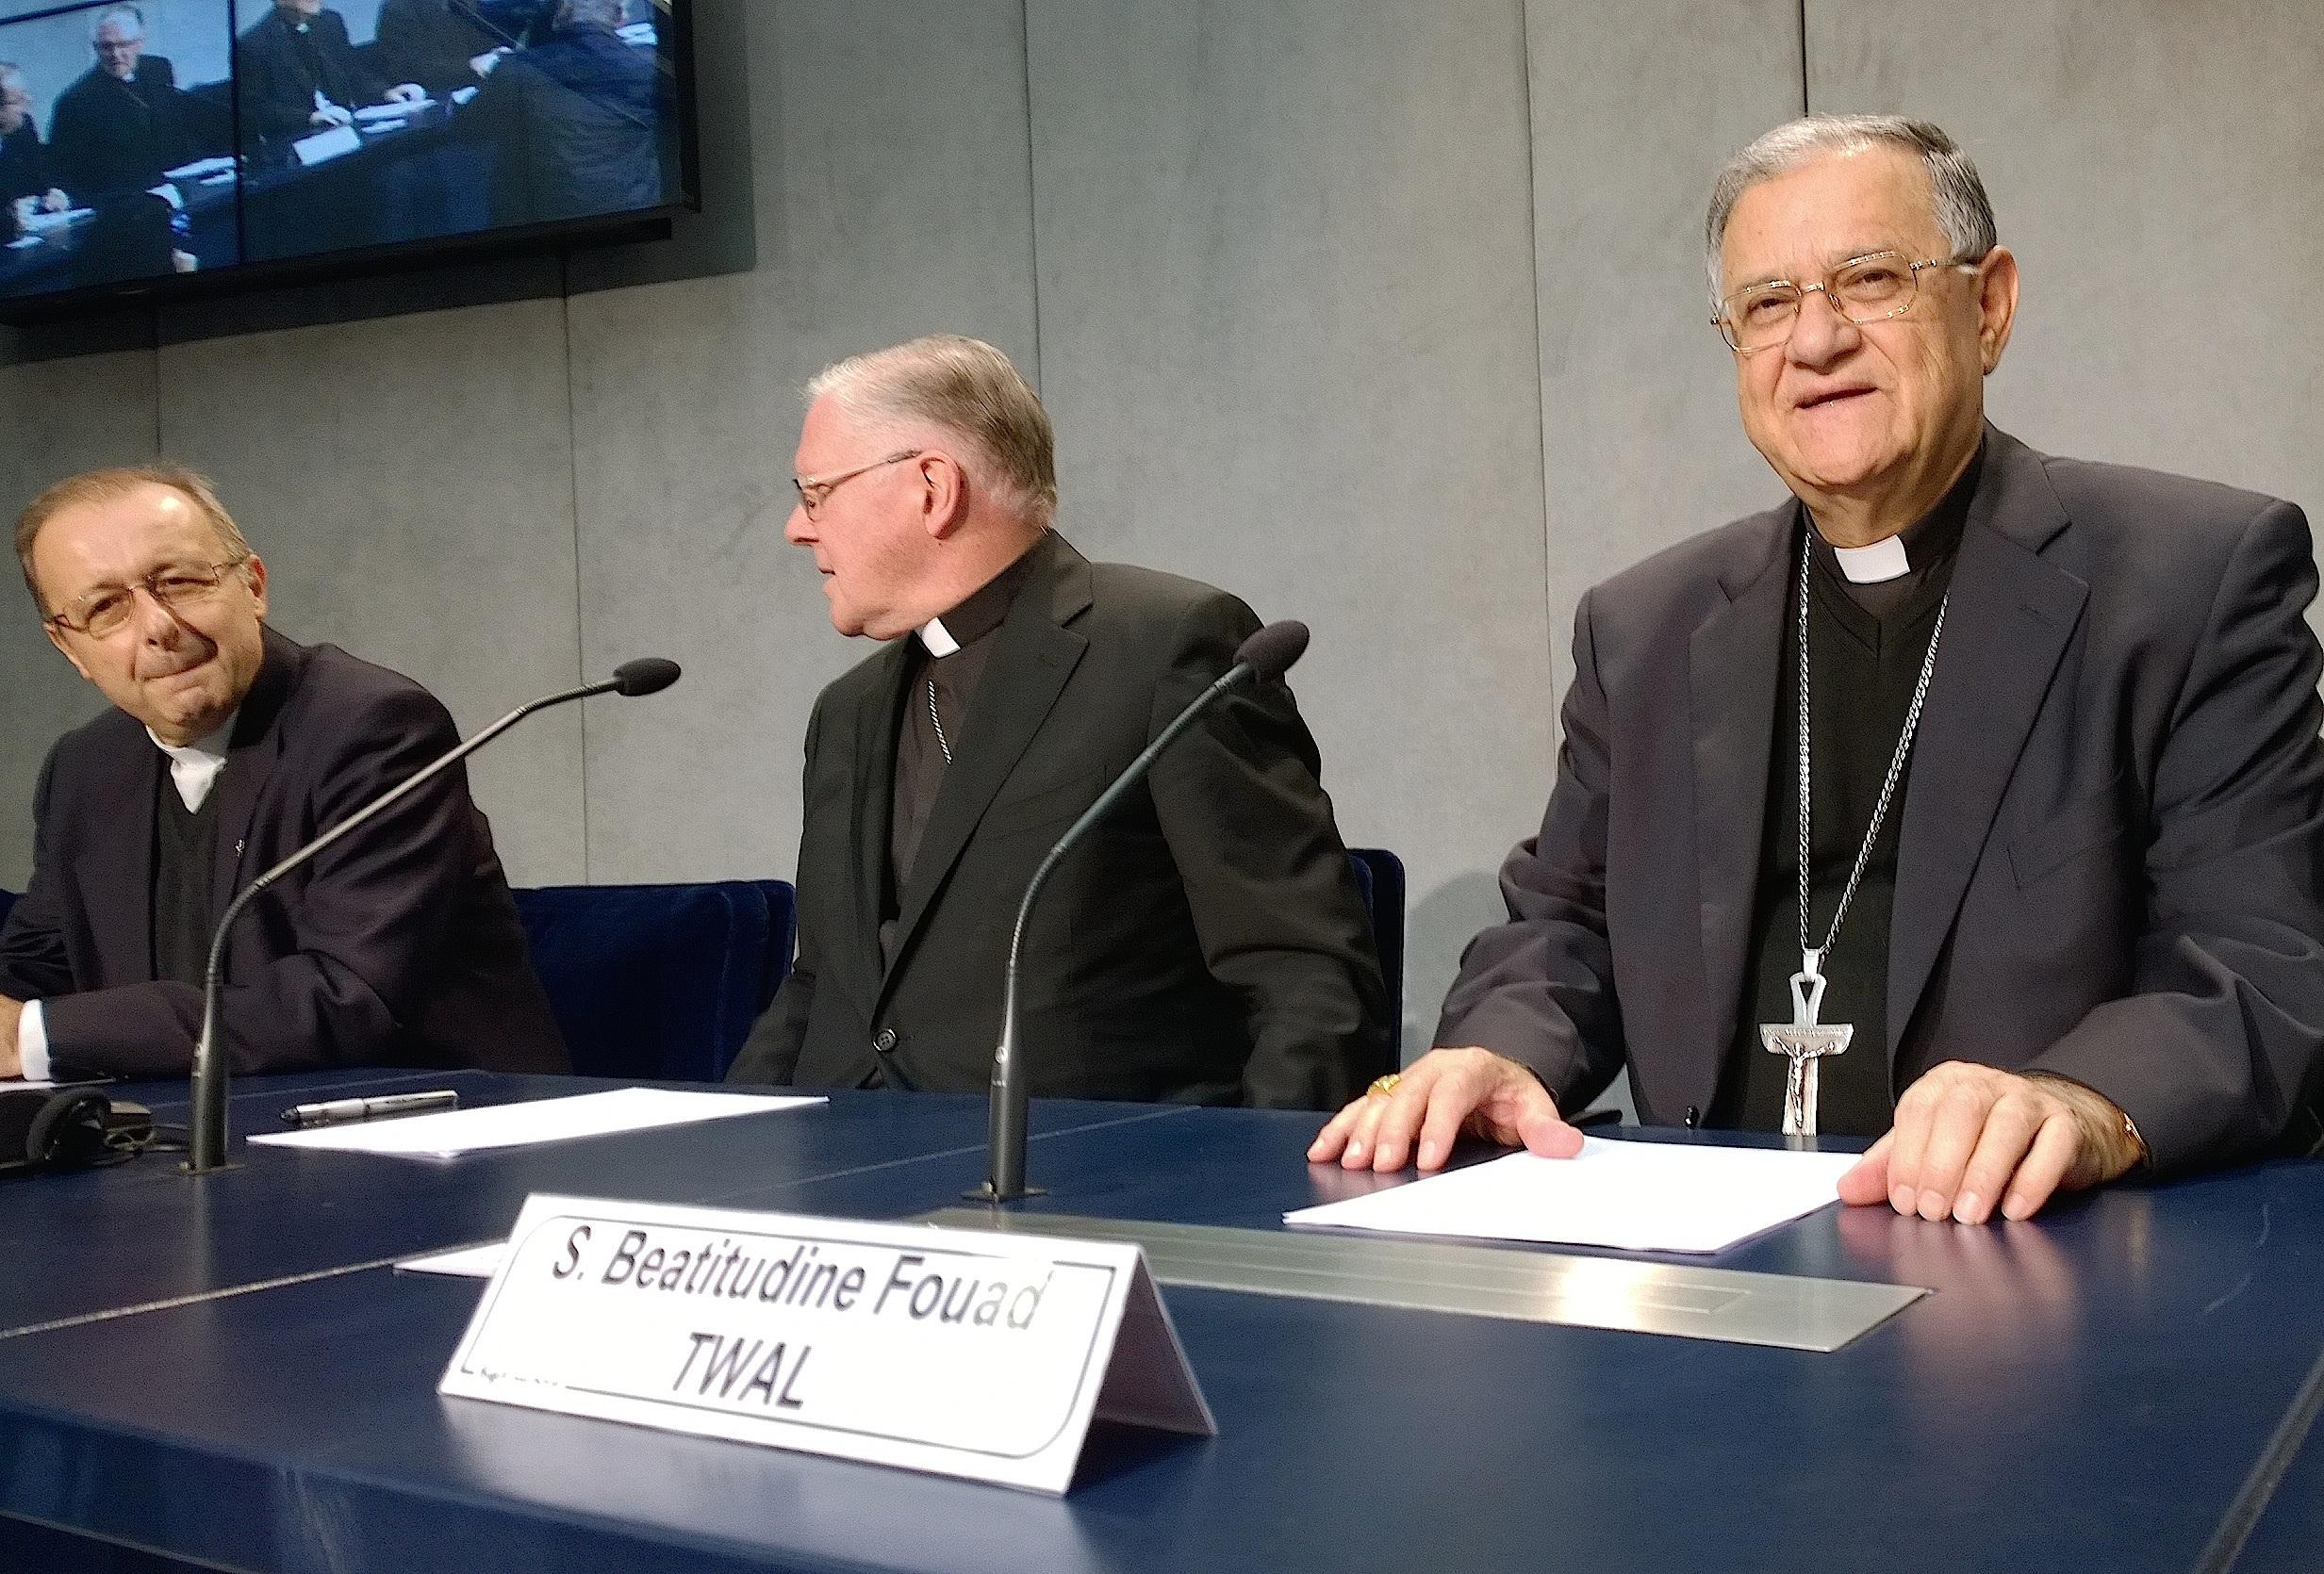 Patriarch Fouad Twal - briefing 19 Oct. 2015